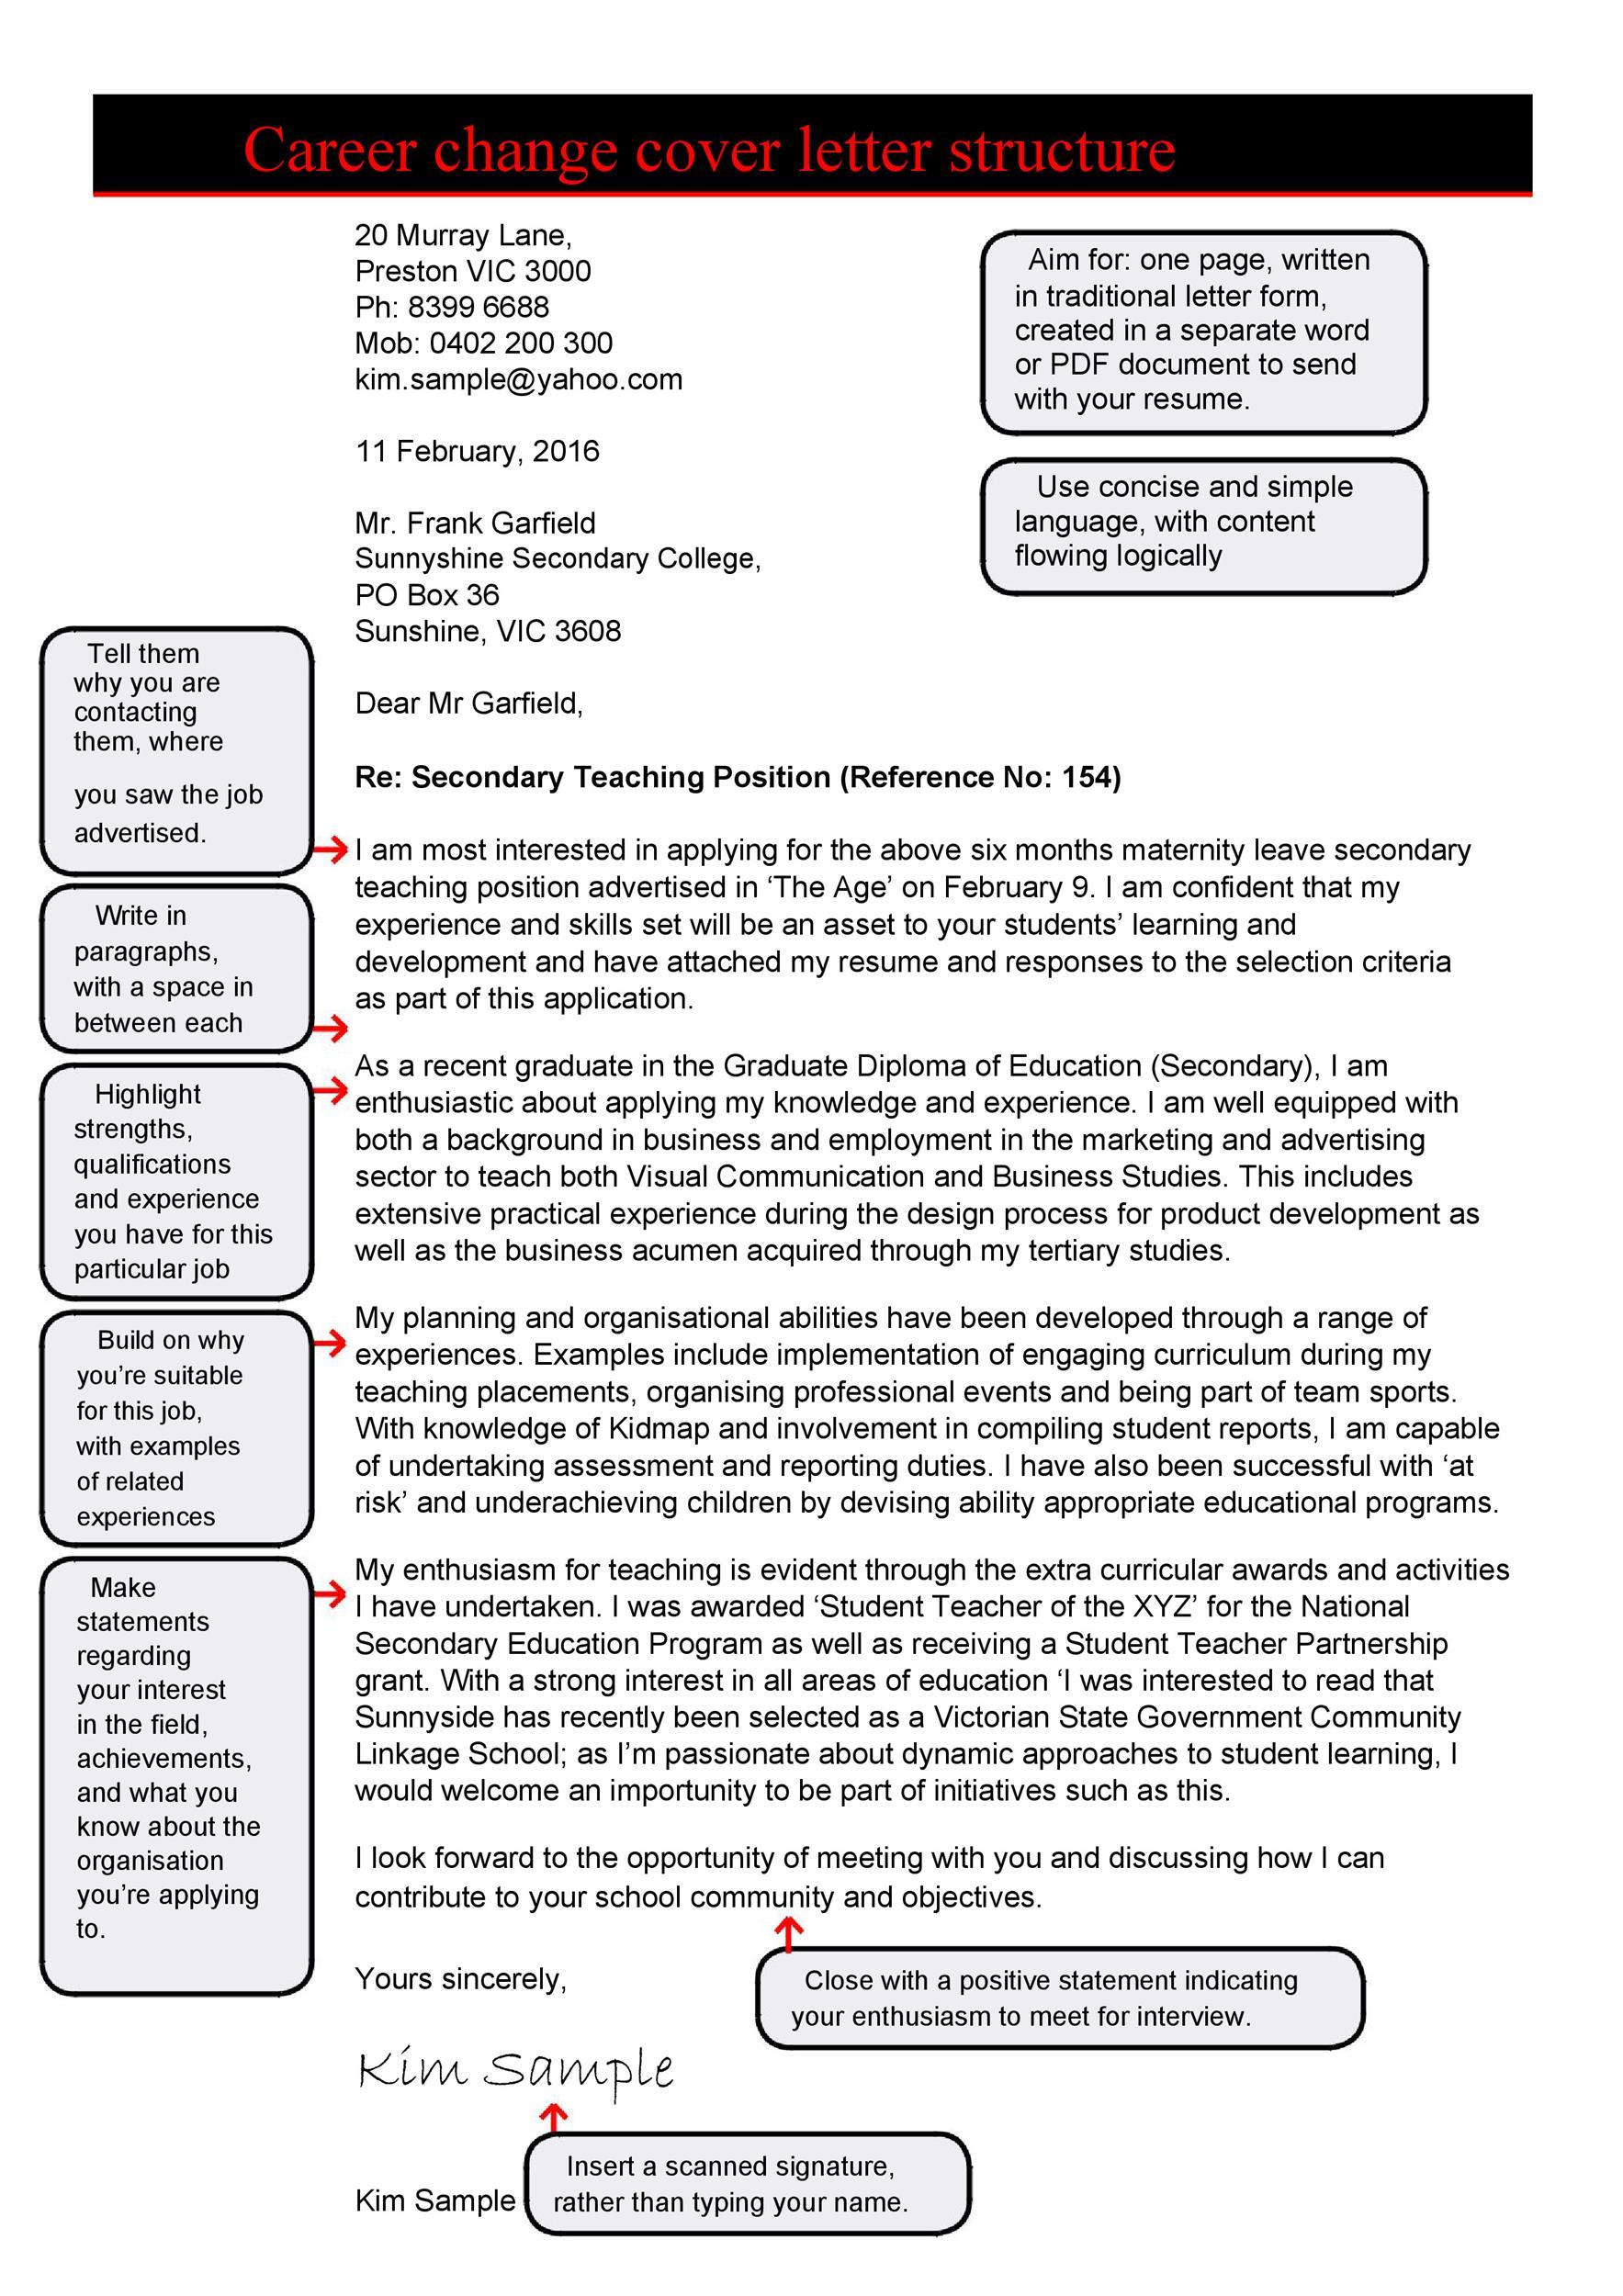 Career Change Cover Letter Pdf.39 Professional Career Change Cover Letters ᐅ Template Lab